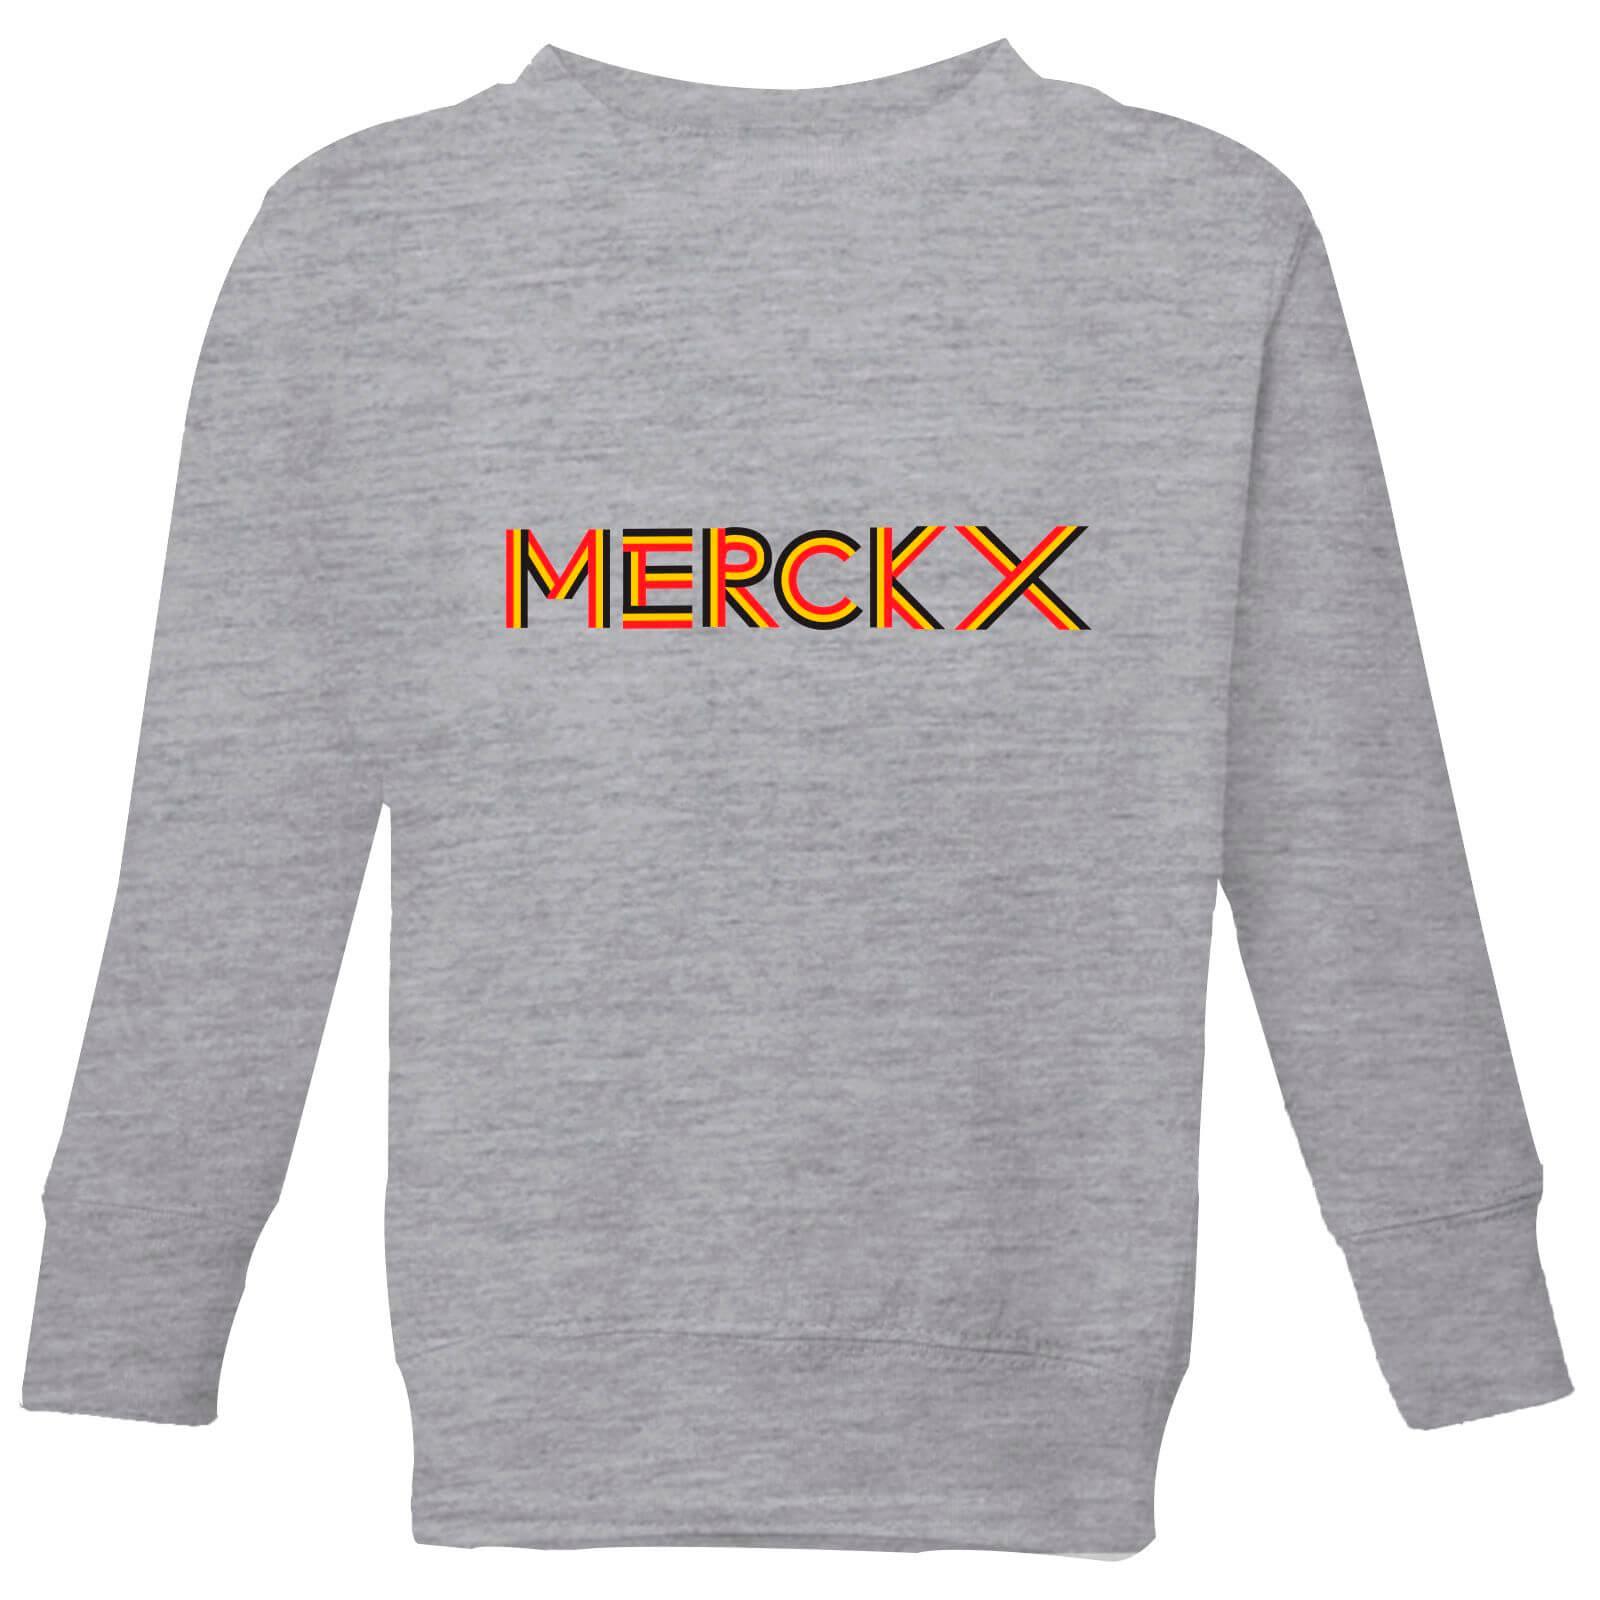 Summit Finish Merckx - Rider Name Kids' Sweatshirt - Grey - 5-6 Jahre - Grau